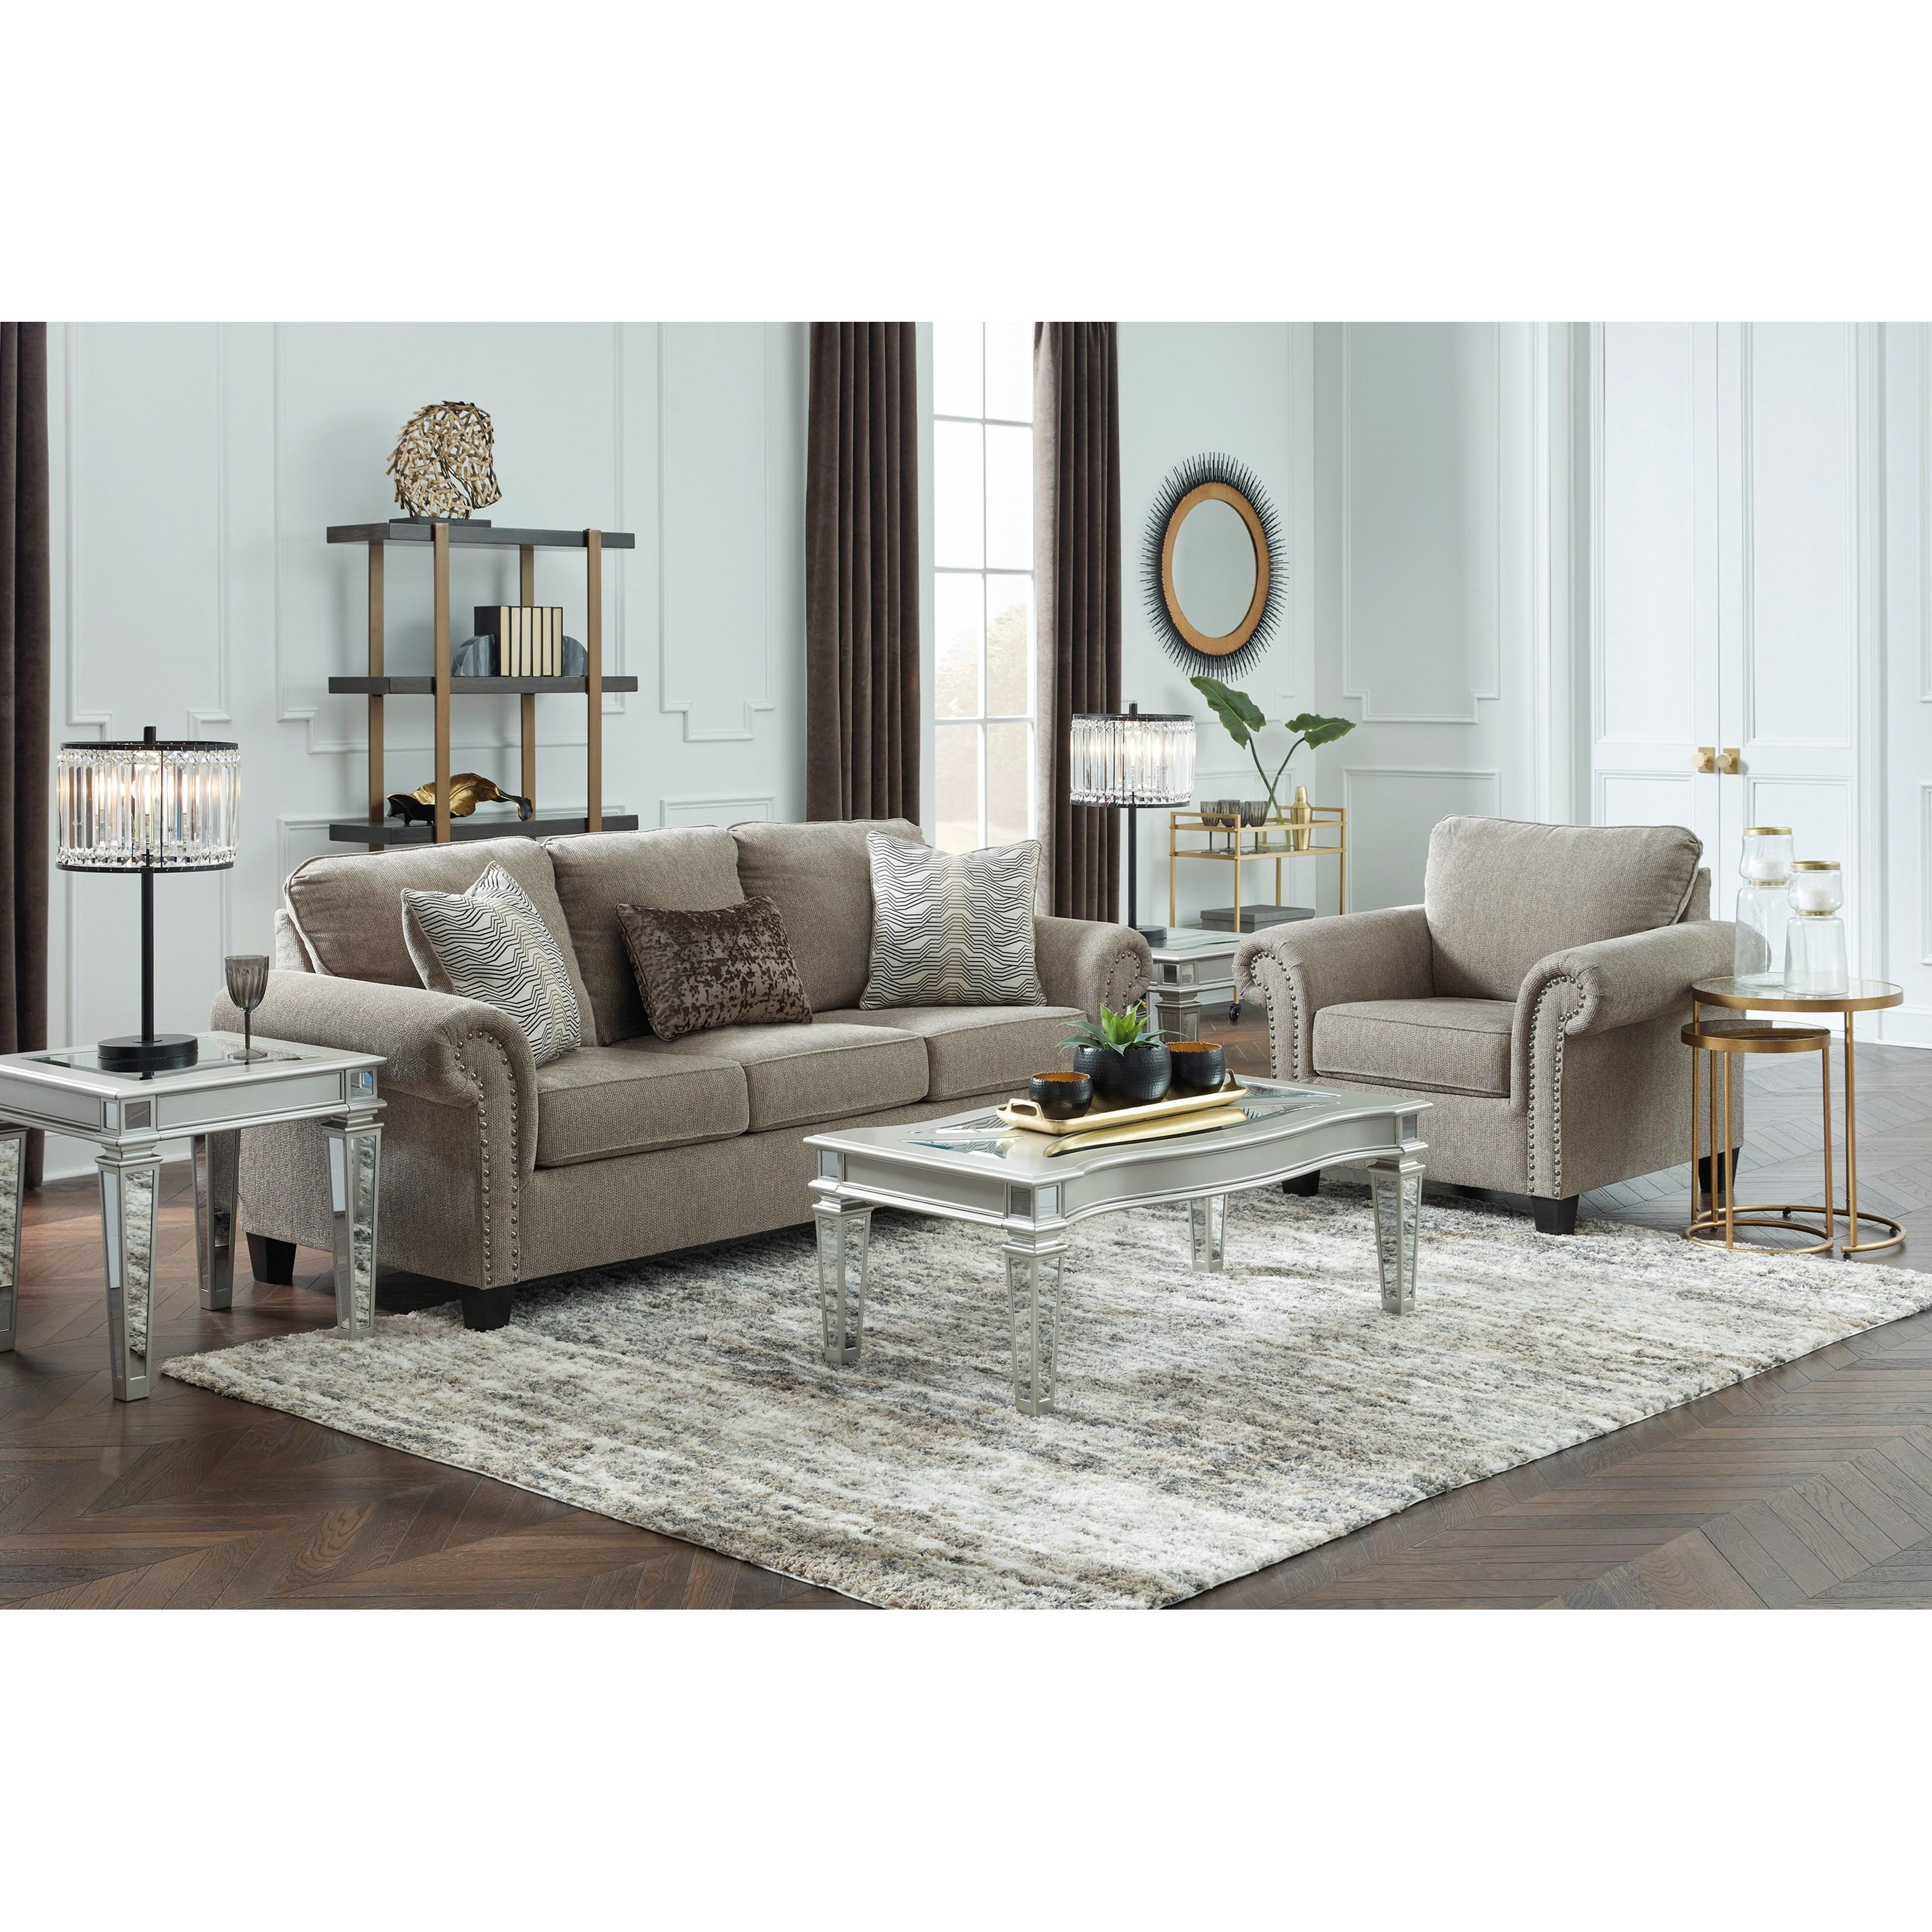 Shewsbury Living Room Group by Benchcraft at Pilgrim Furniture City